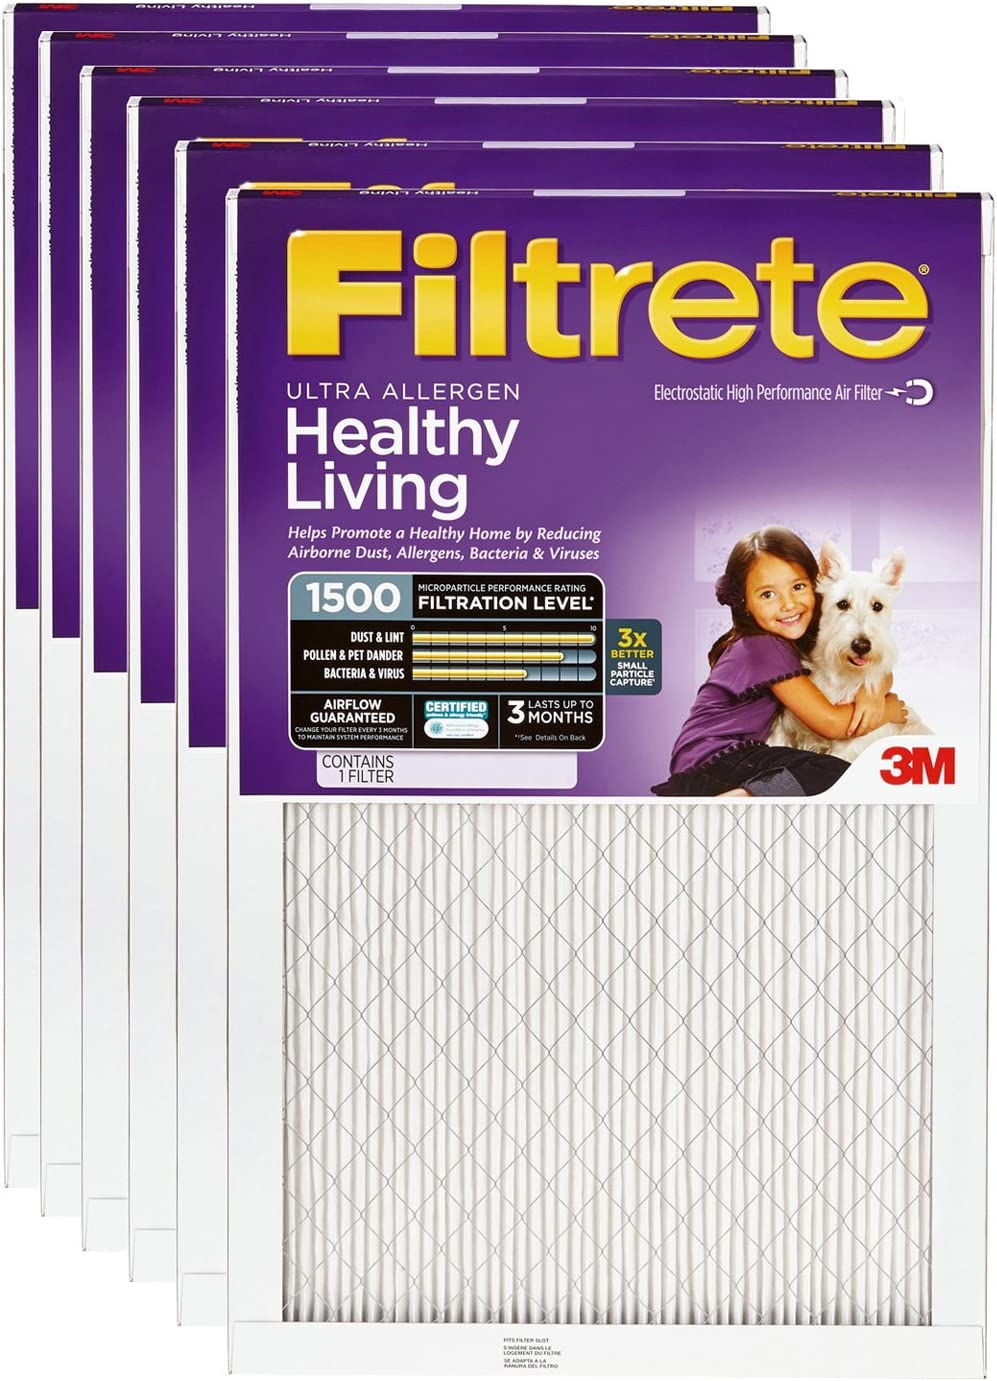 19.6 x 24.6 Filtrete 1250 Ultra Allergen Filter by 3M 4 Pack 20x25x1